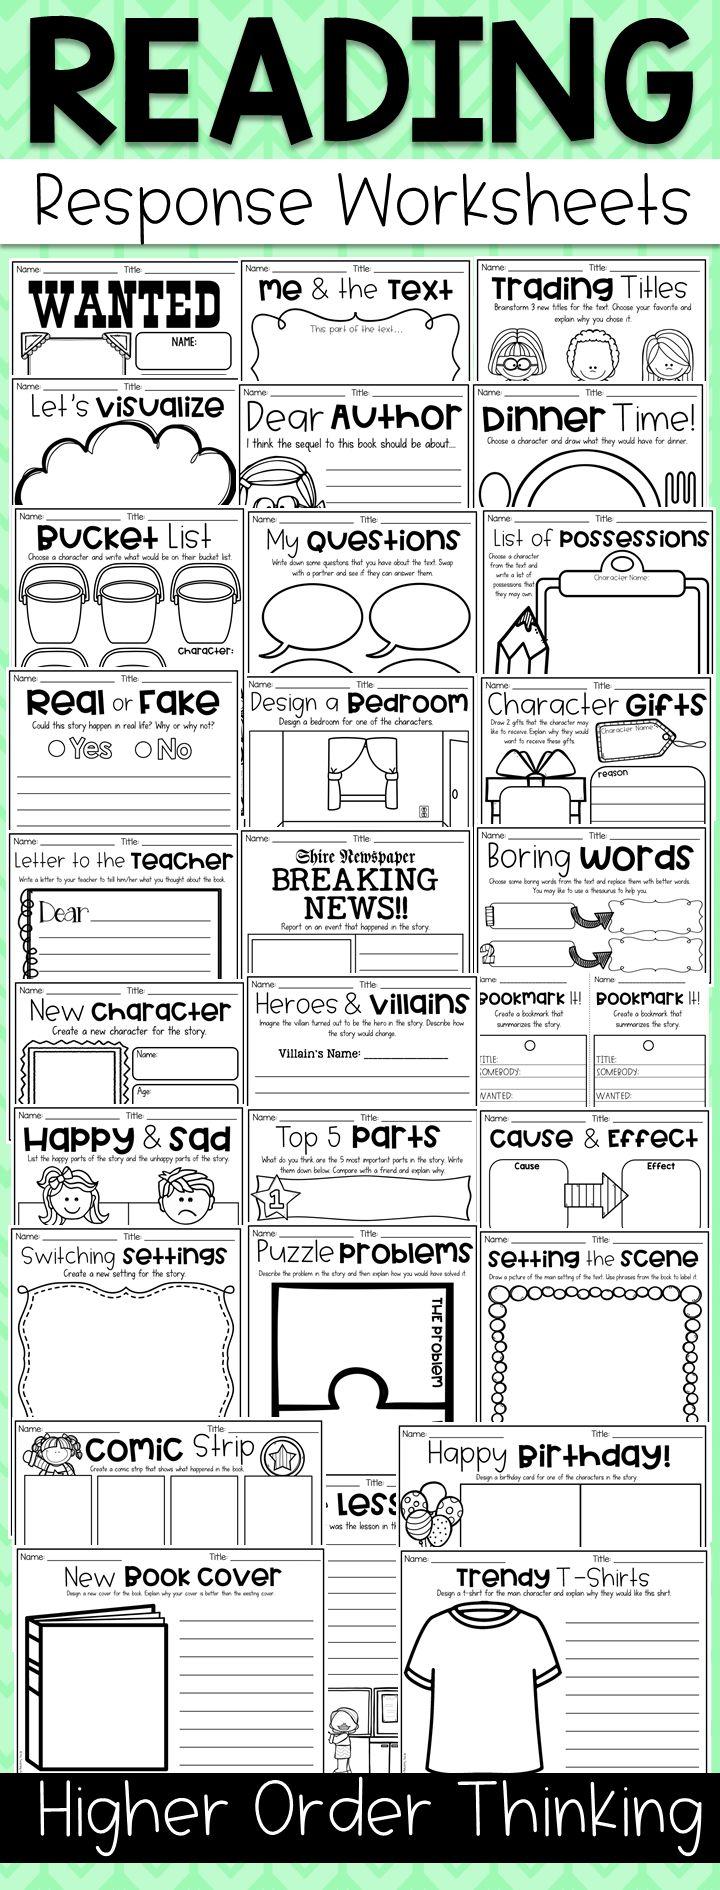 Worksheets Hink Pink Worksheets workbooks hink pink worksheets free printable for pre 5049 best school images on pinterest book and